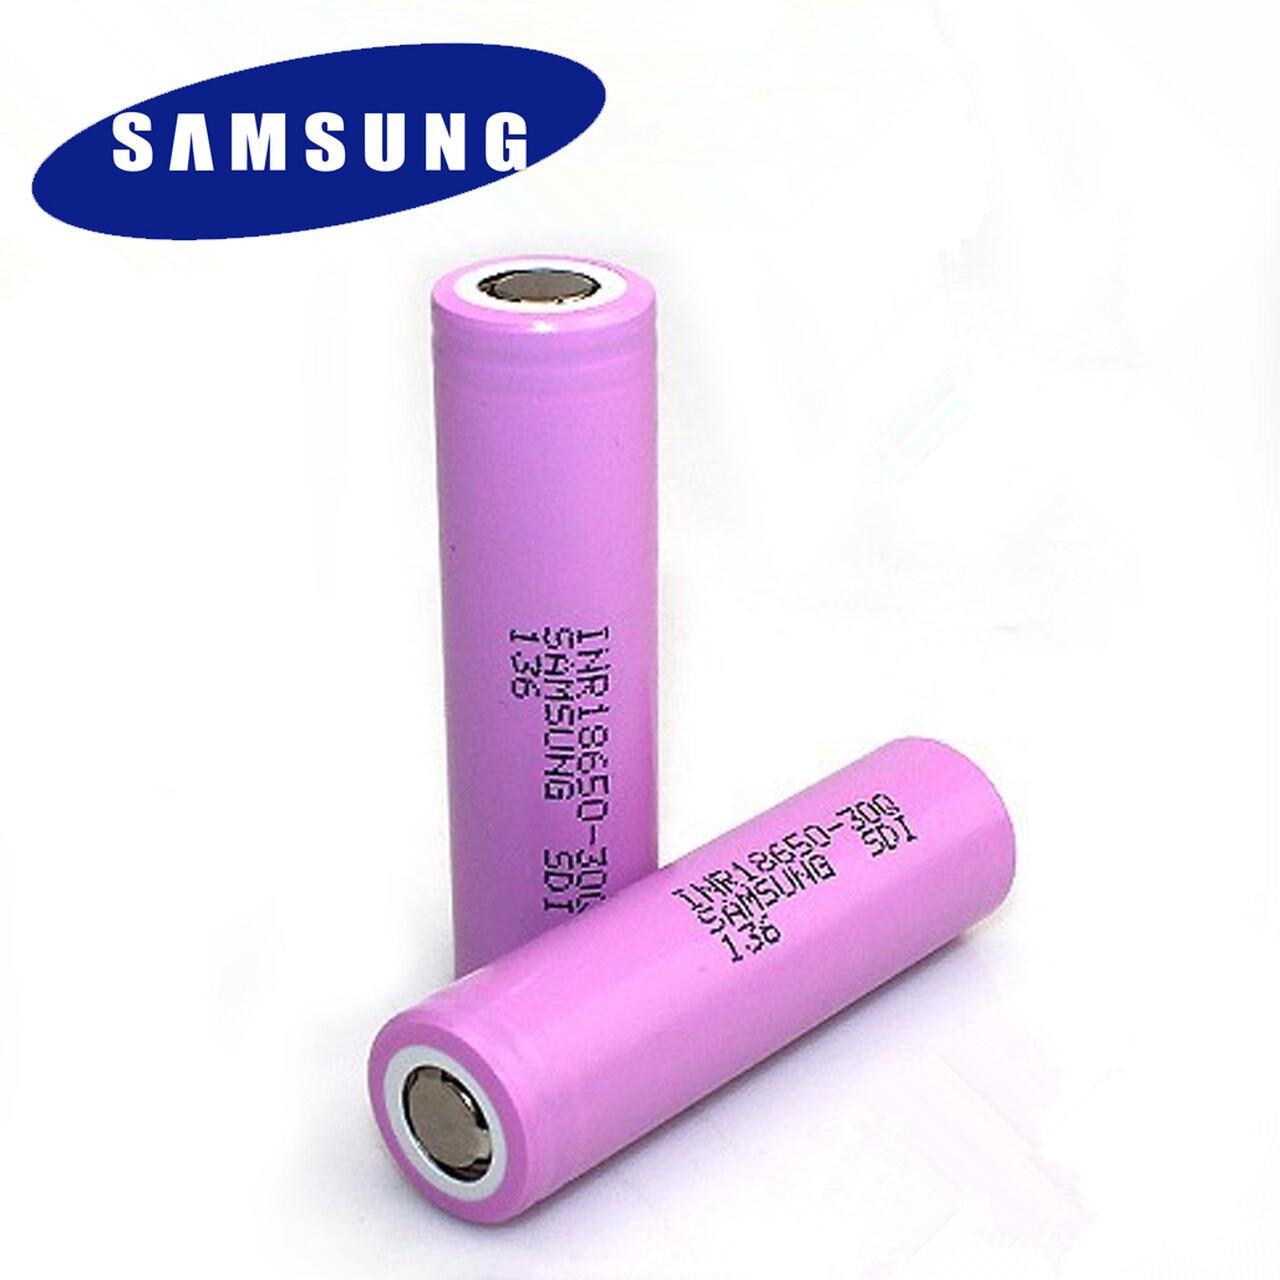 Samsung 30Q 18650 3000mah